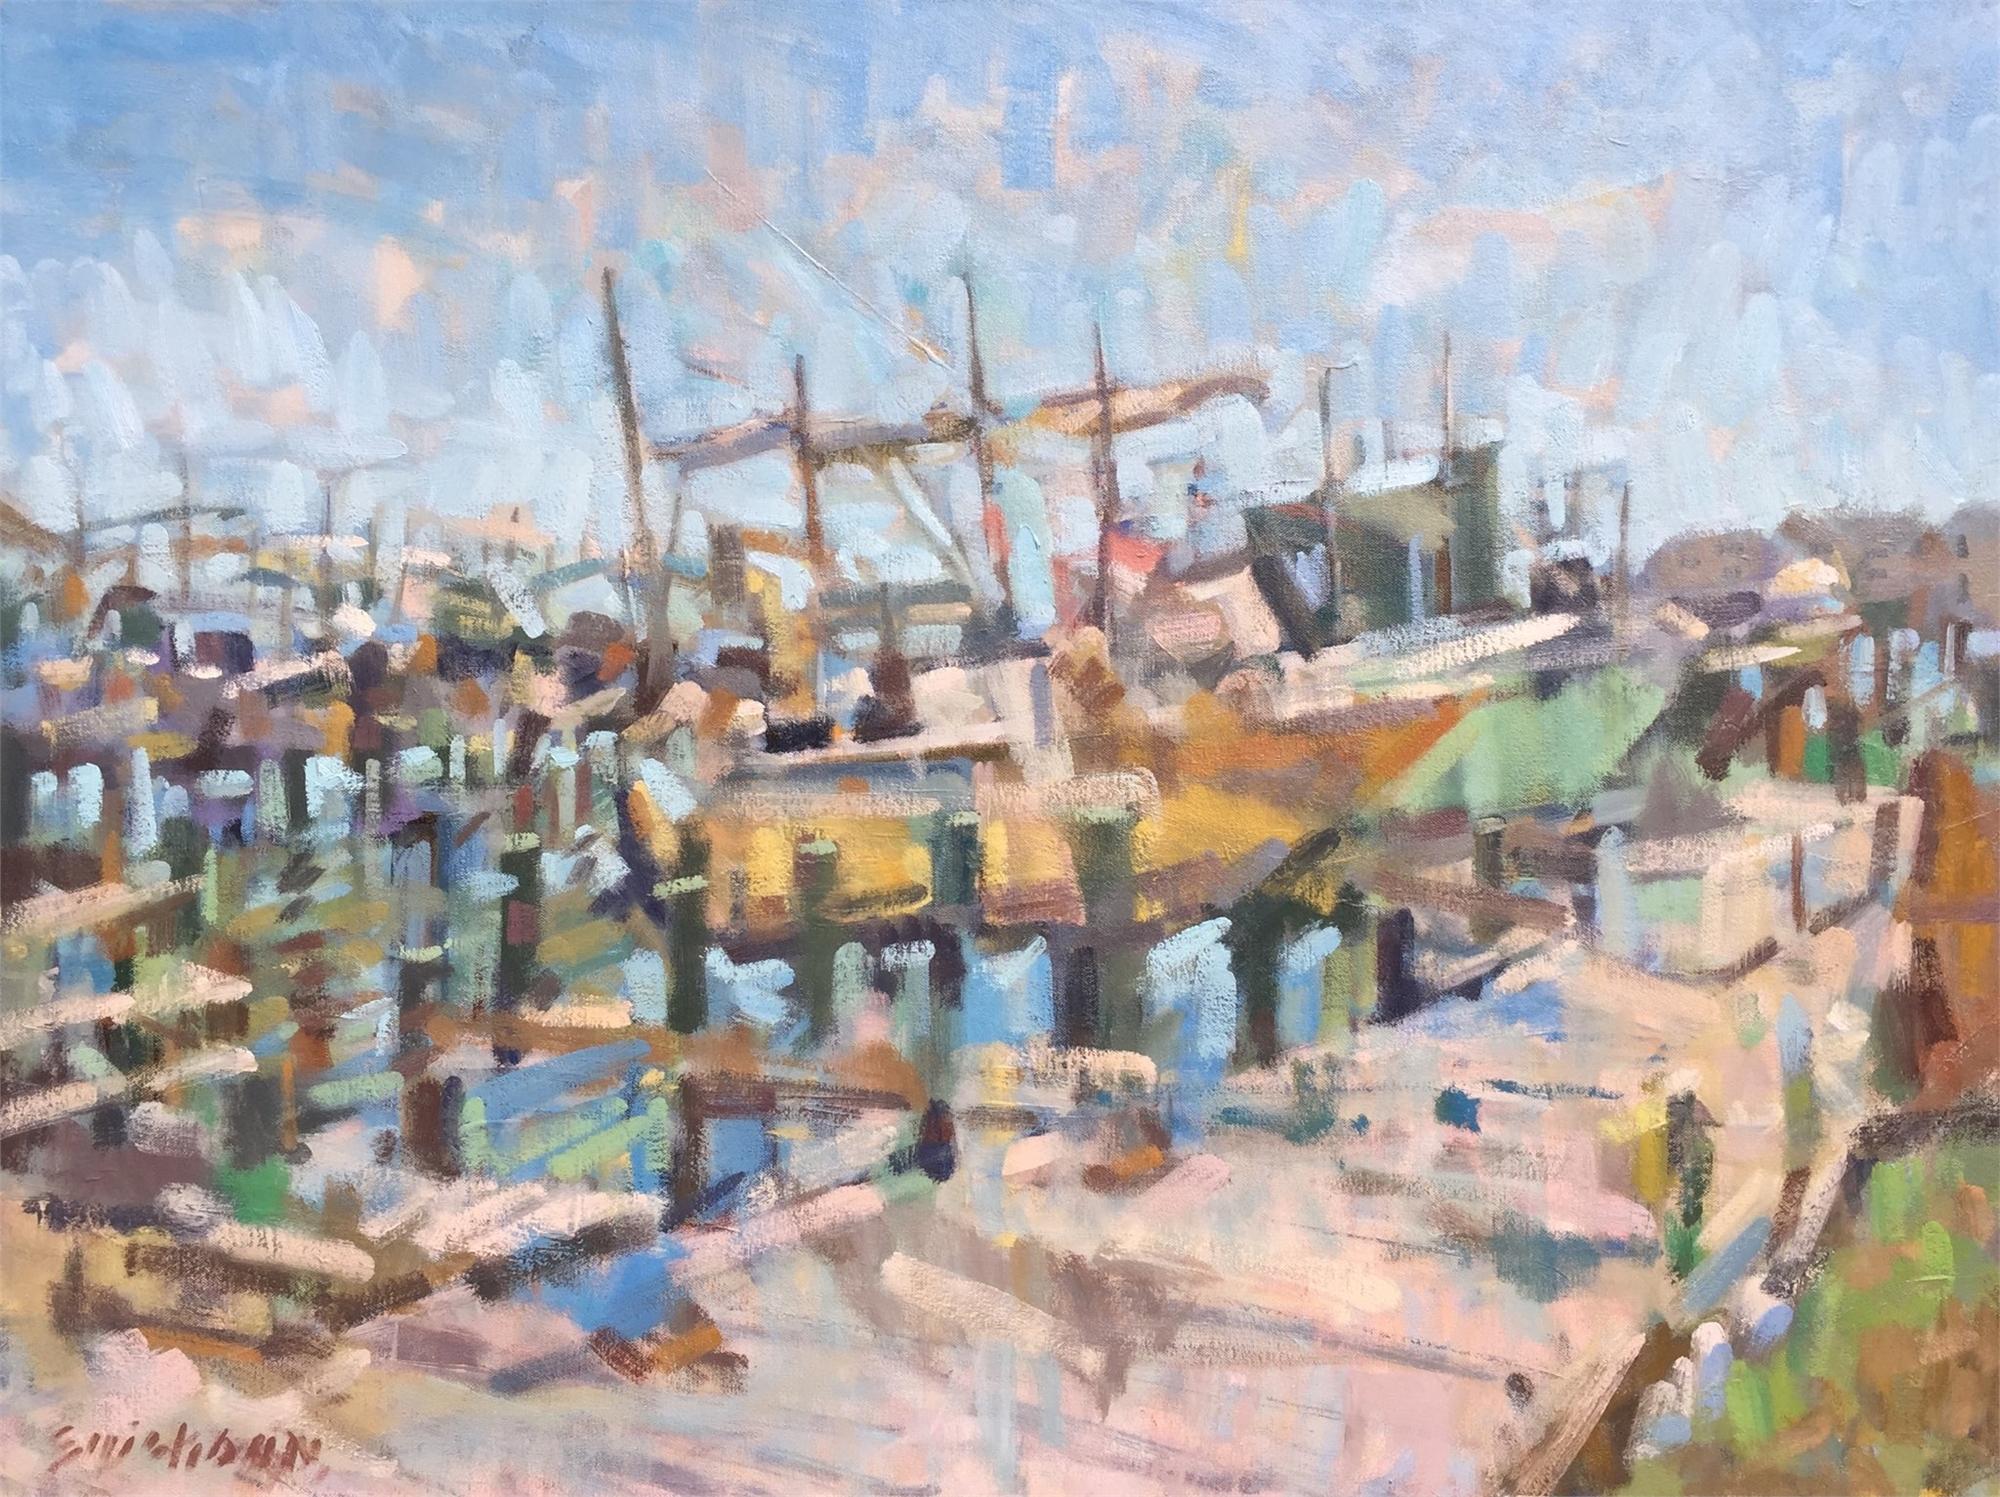 Marina by James Erickson